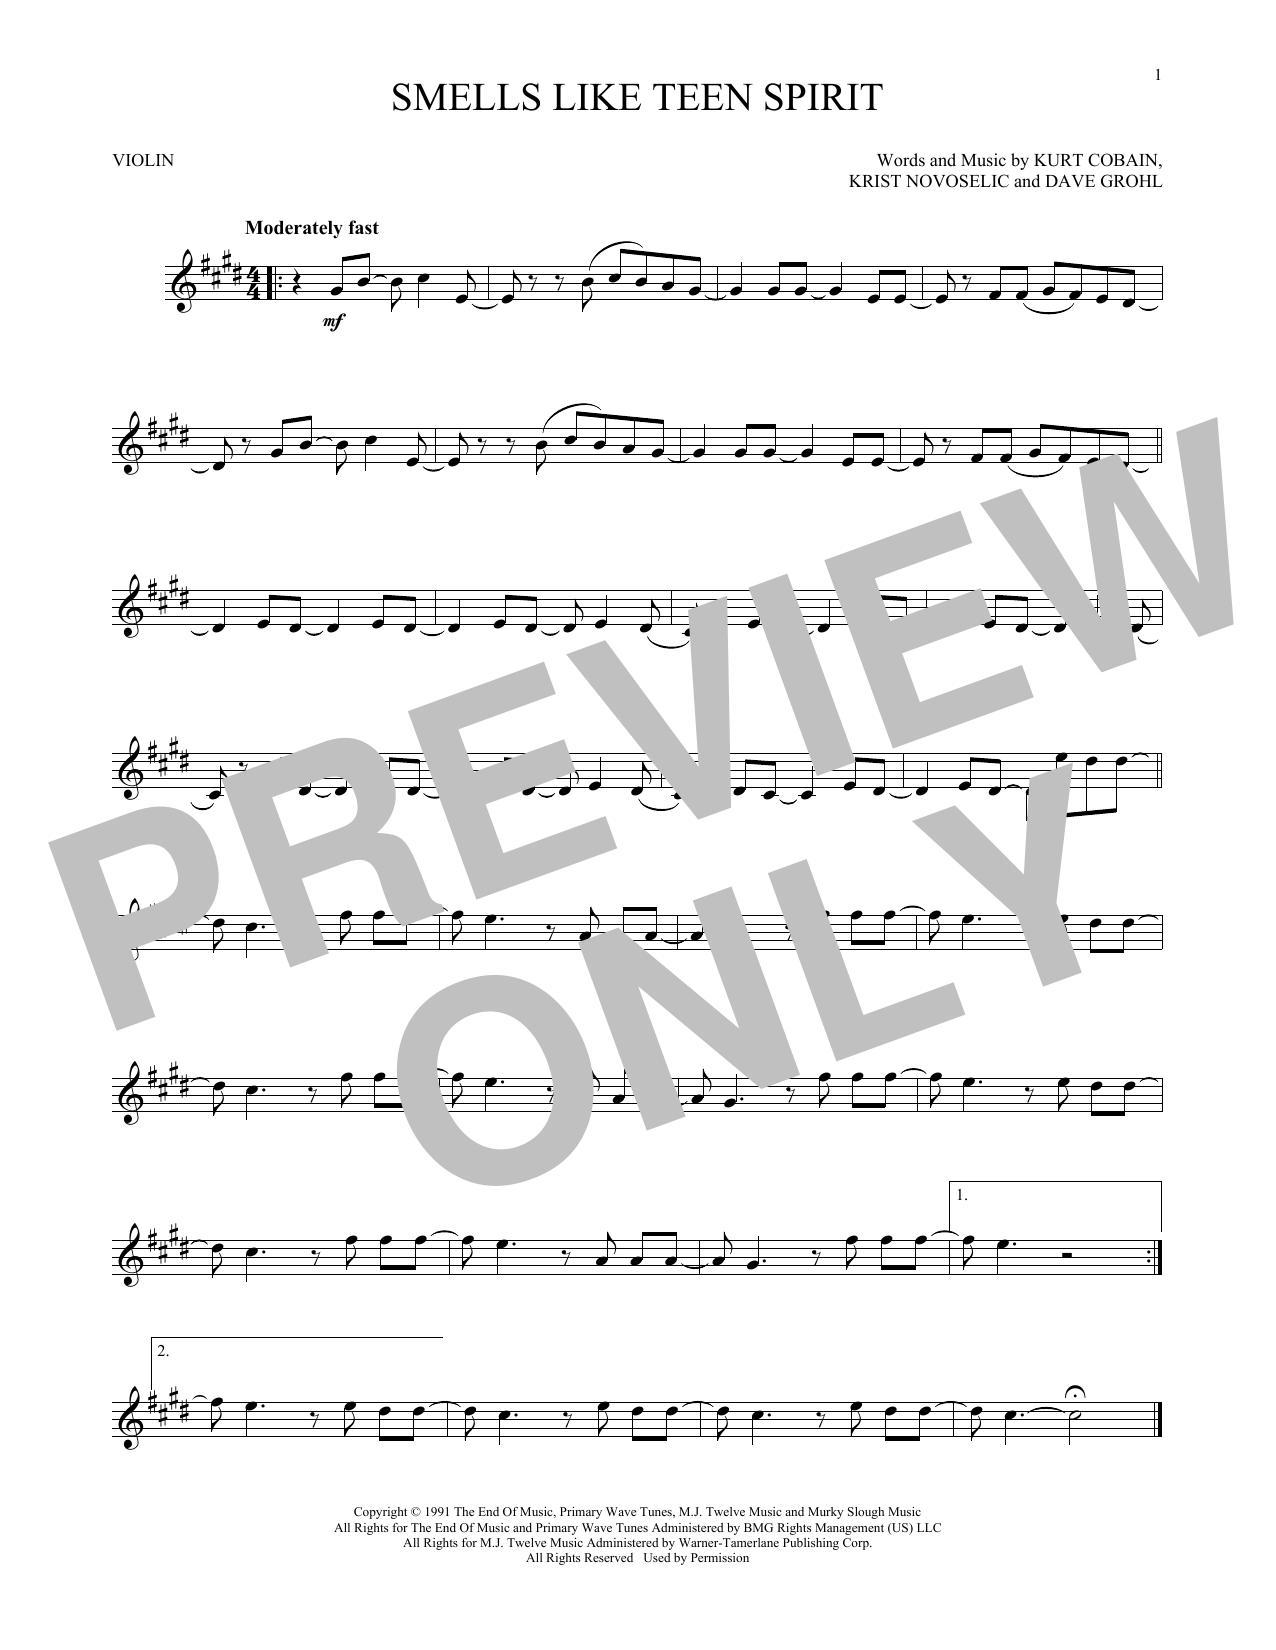 Violin sheet music at stantons sheet music nirvana smells like teen spirit hexwebz Choice Image